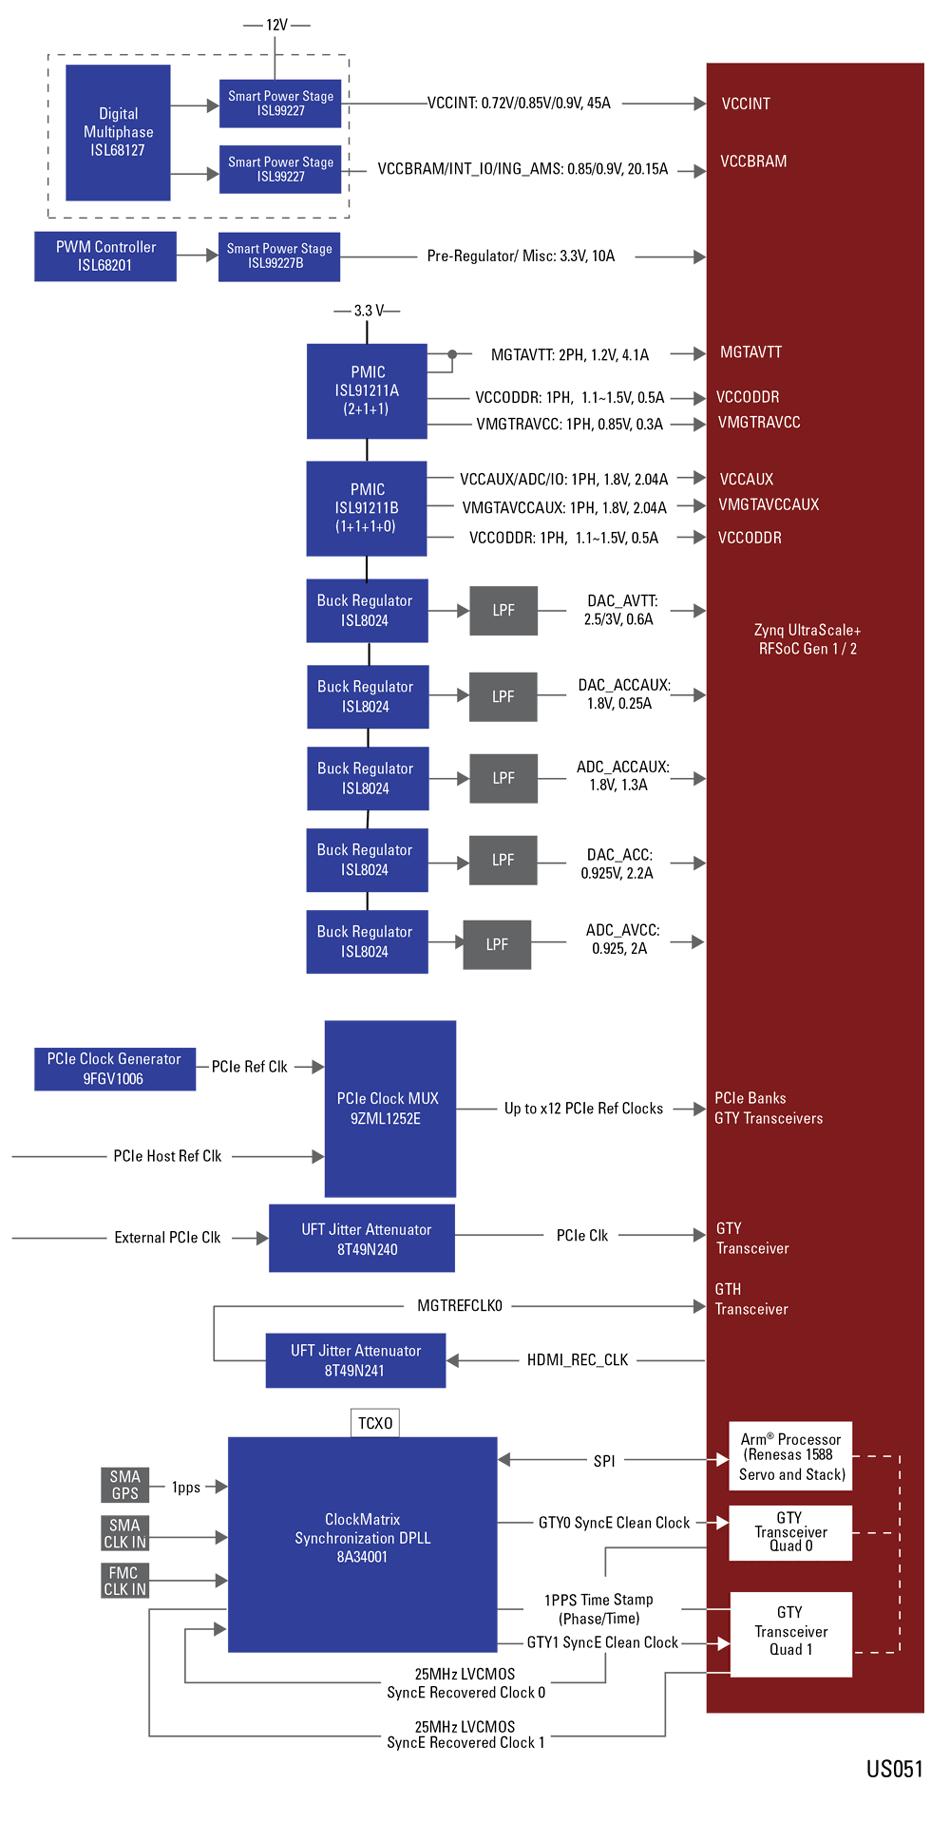 Xilinx UltraScale+ RFSoC Gen 1/2 ZU2x/3x Power and Timing   IDT